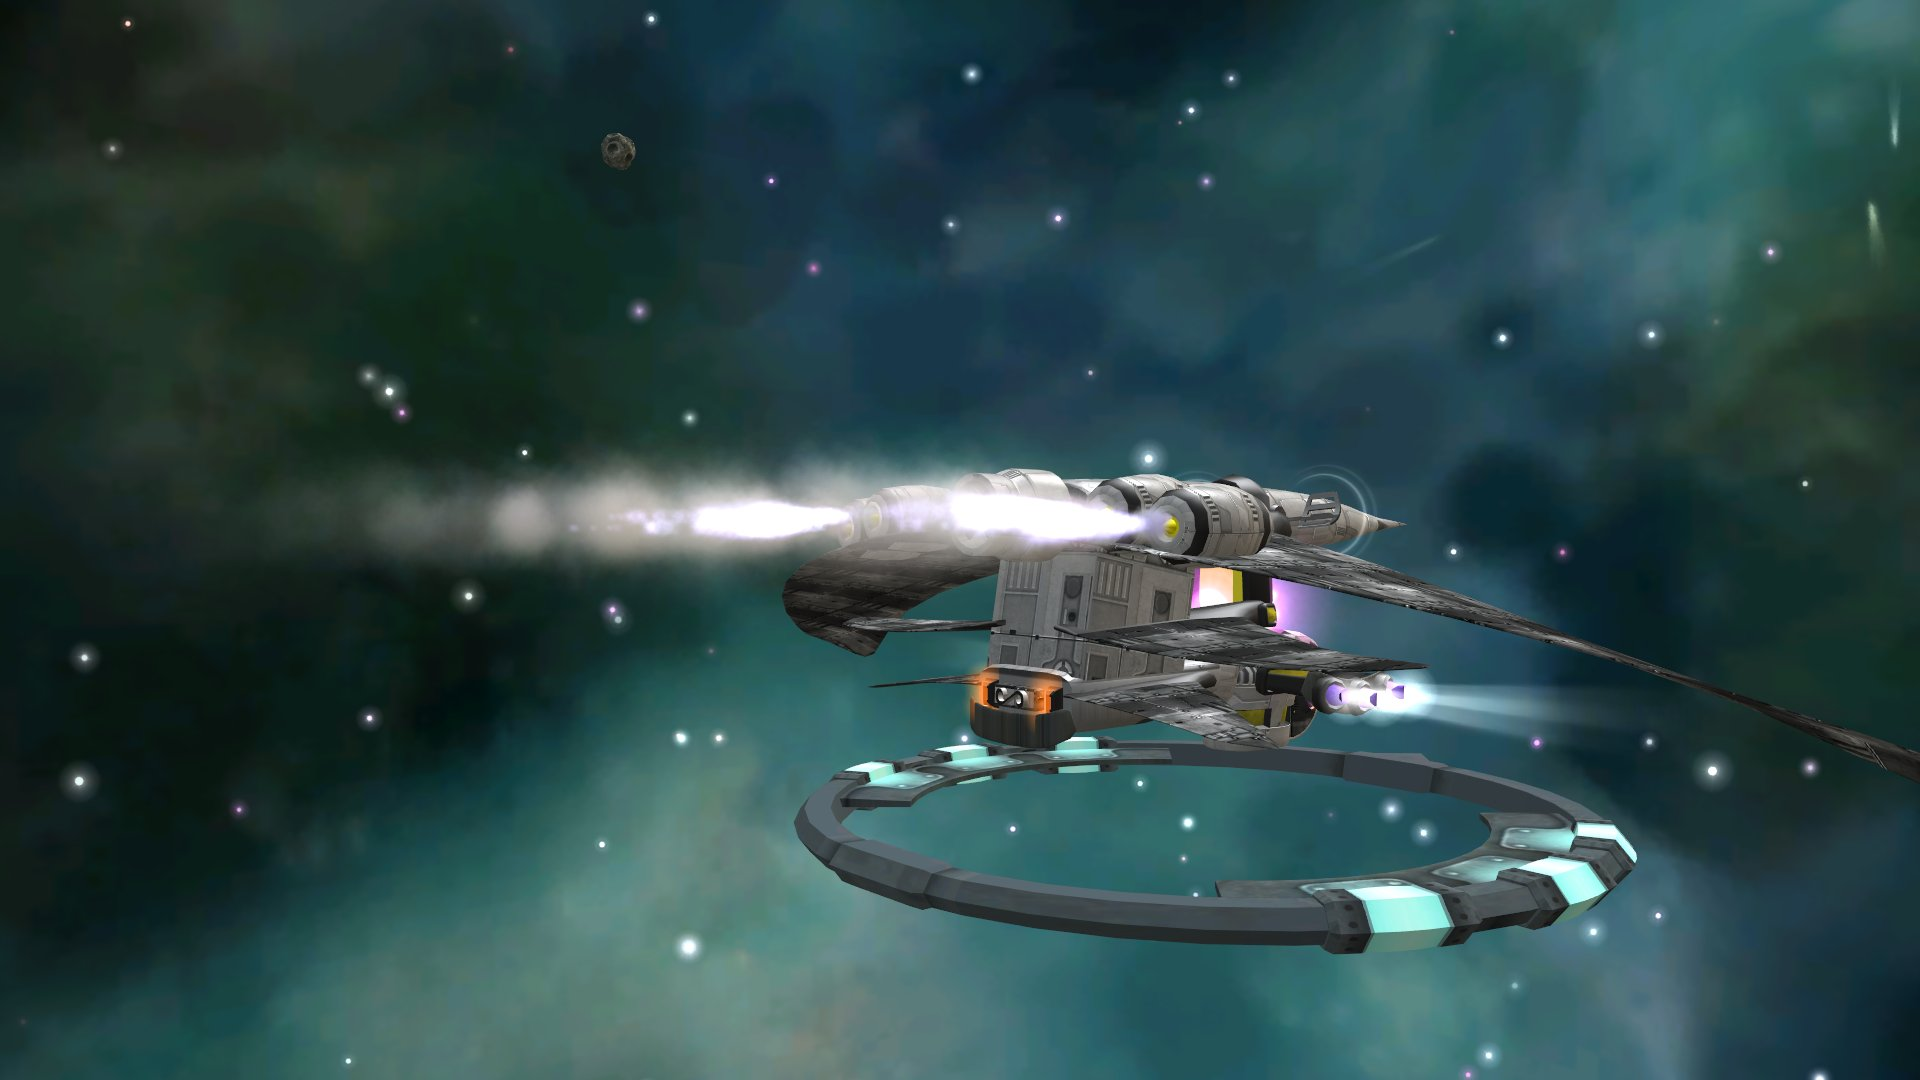 (21) Naves del imperio Neimerer LbD12WF